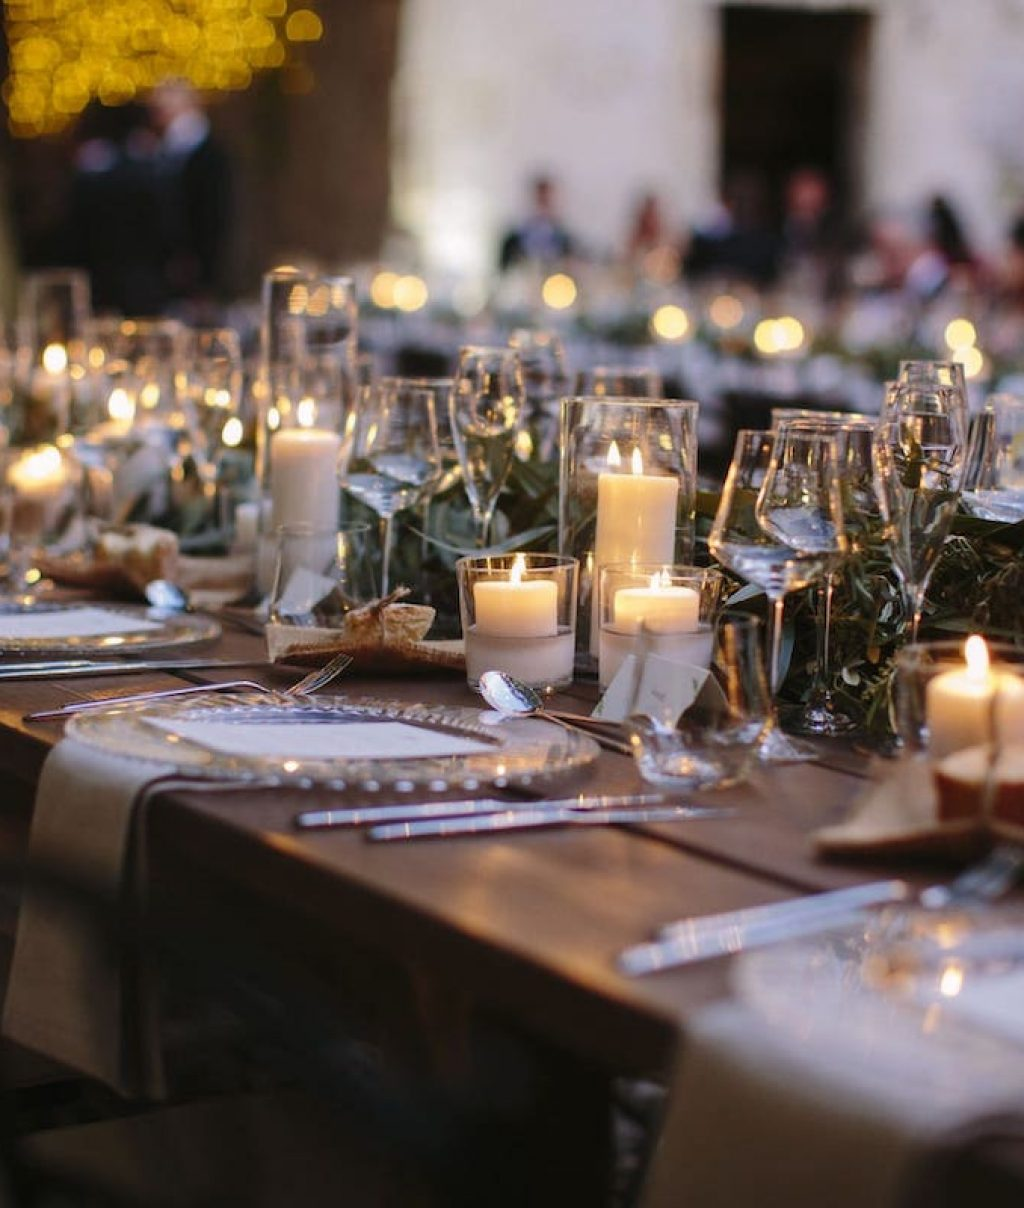 decoración para mesas de boda con flores y velas en Mallorca